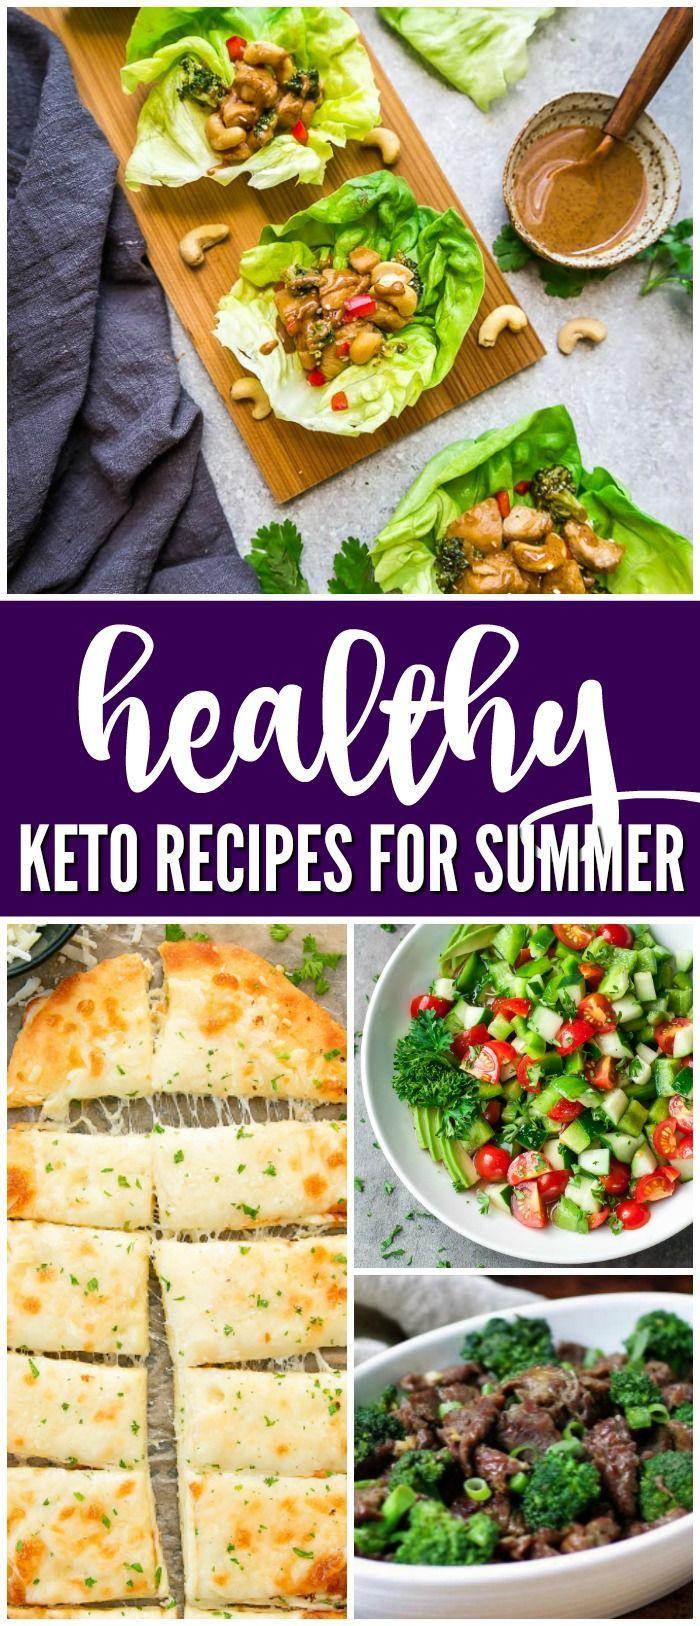 Healthy Keto Recipes For Summer Keto Dinner Healthy Recipes